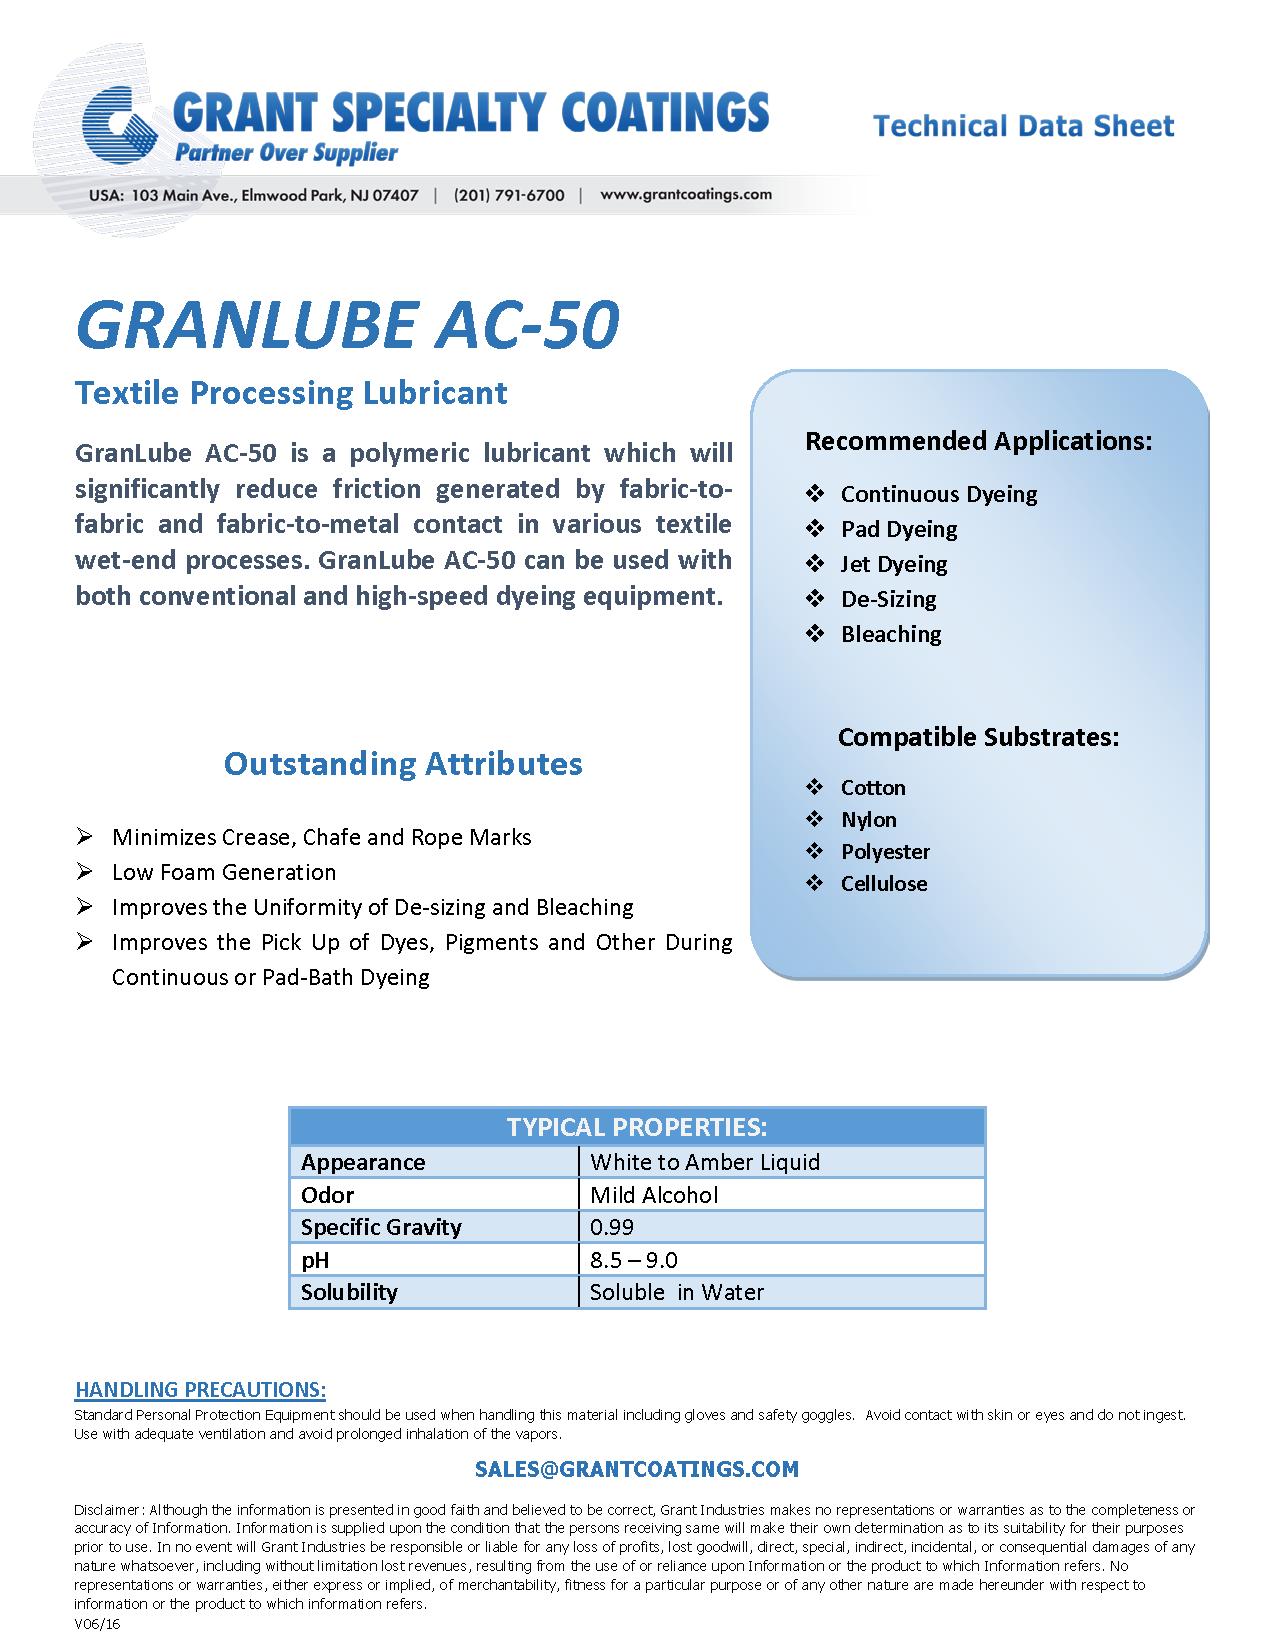 Textile Processing Lubricant GranLube AC-50